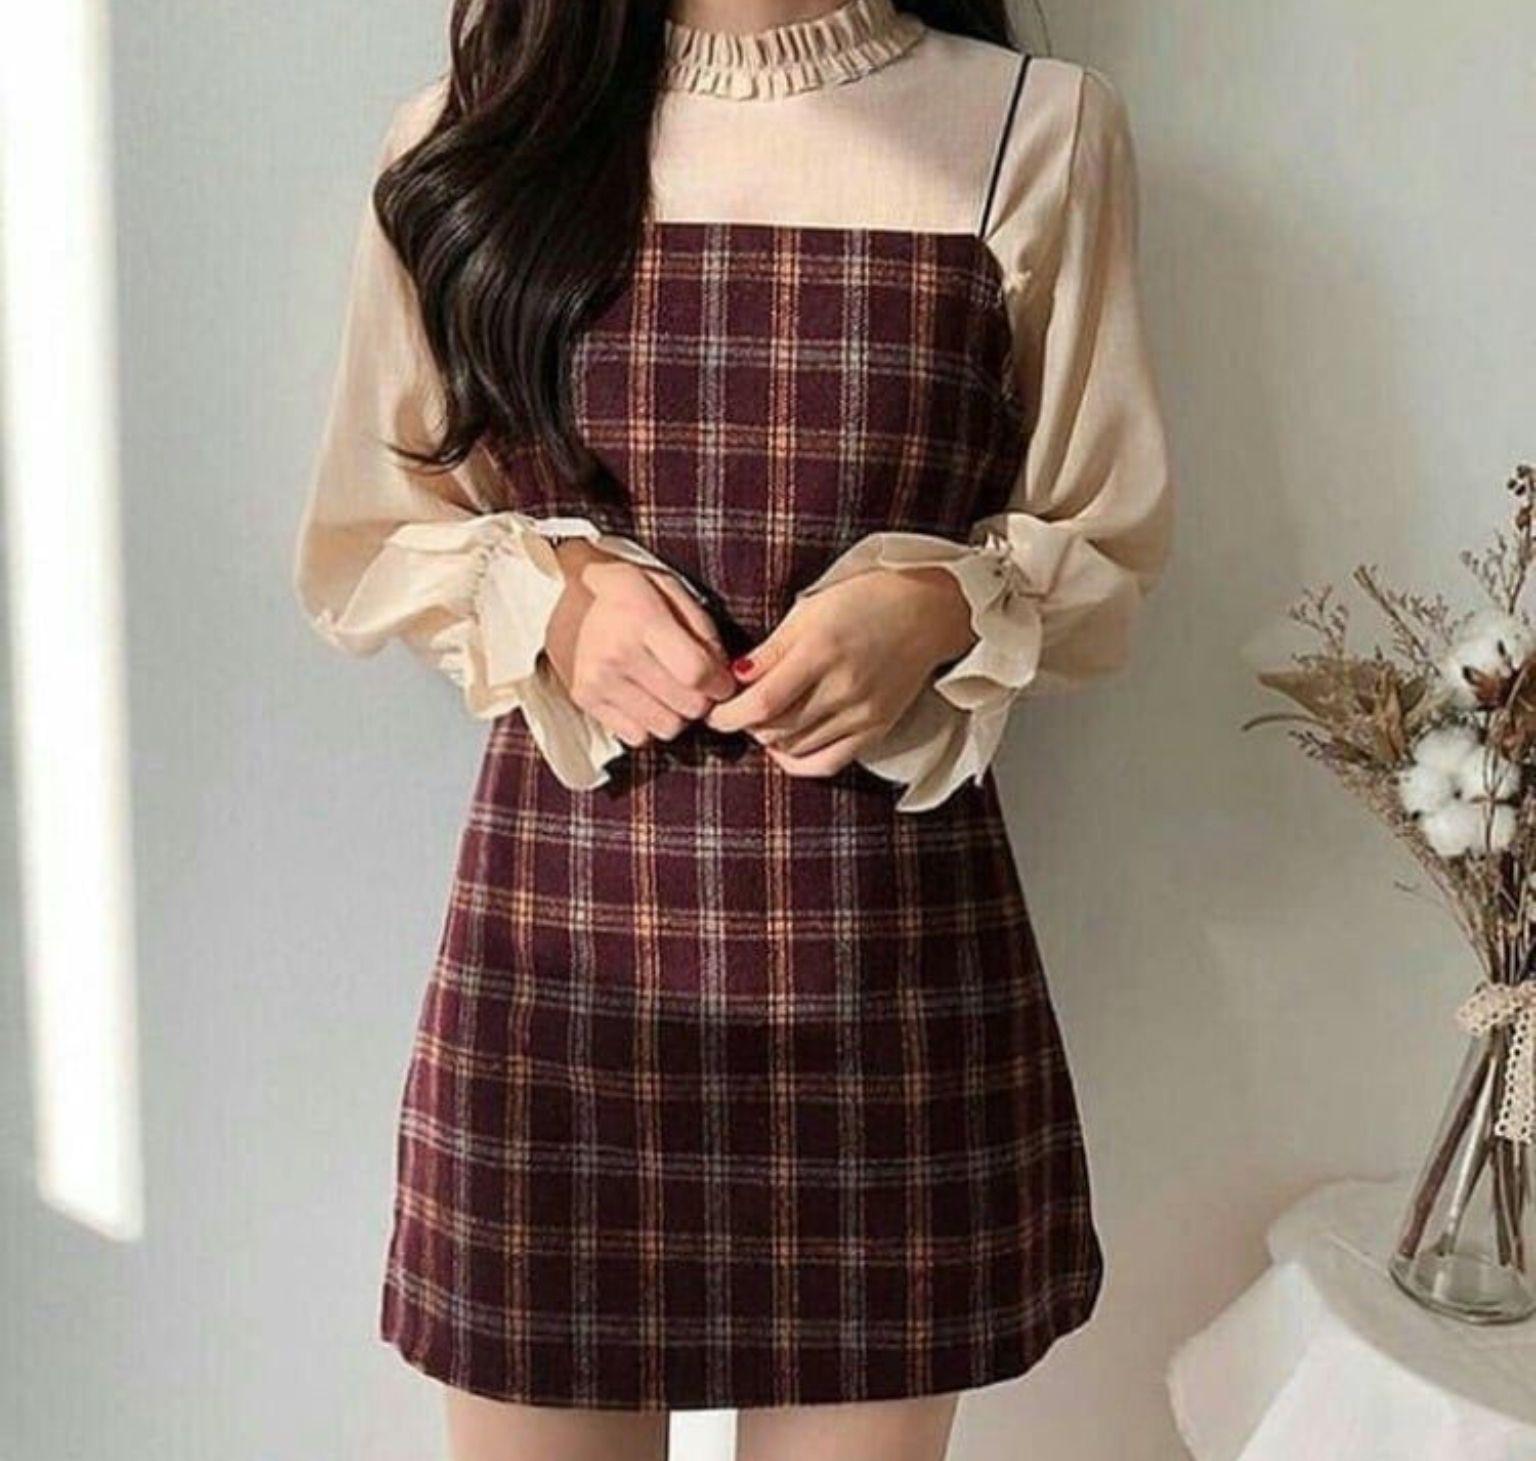 r o s i e  Fashion inspo outfits, Korean girl fashion, Korean outfits